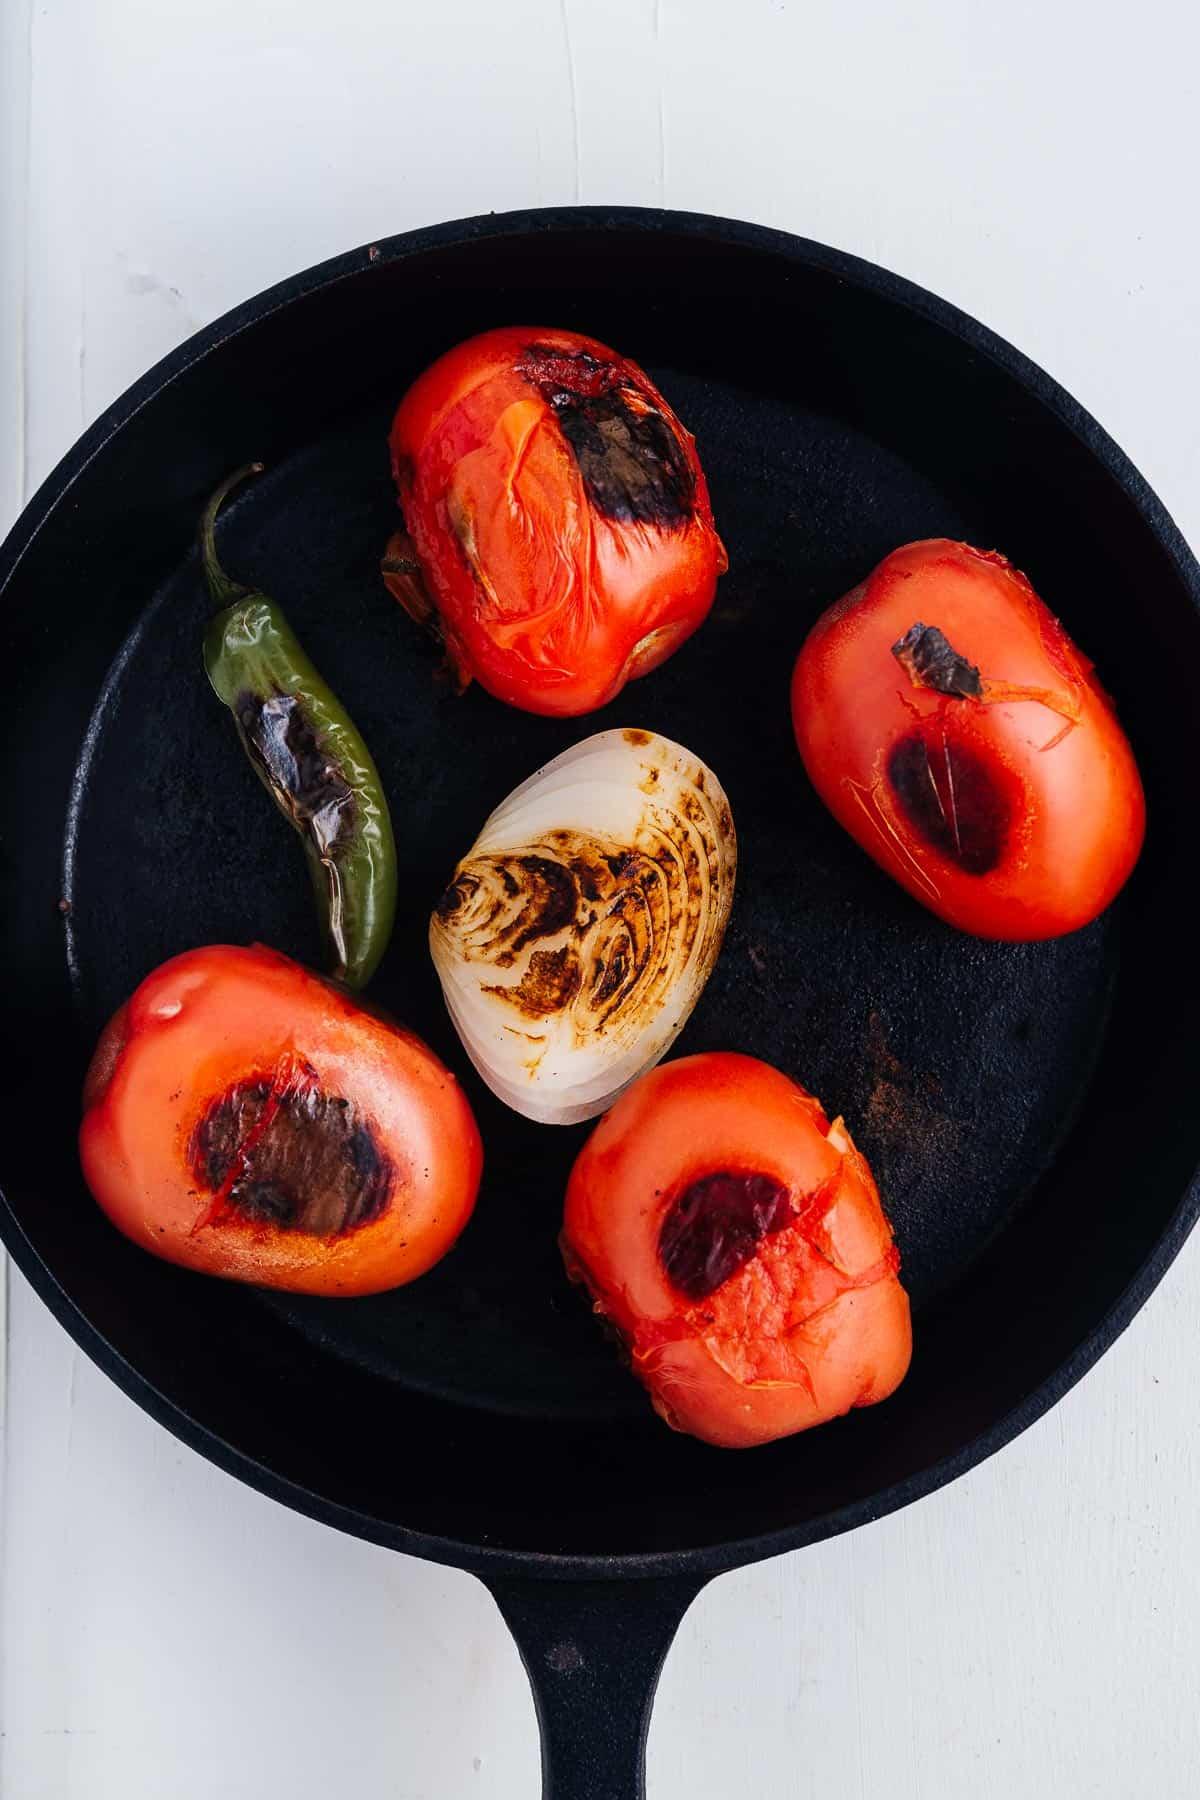 Blackened Vegetables in a Skillet